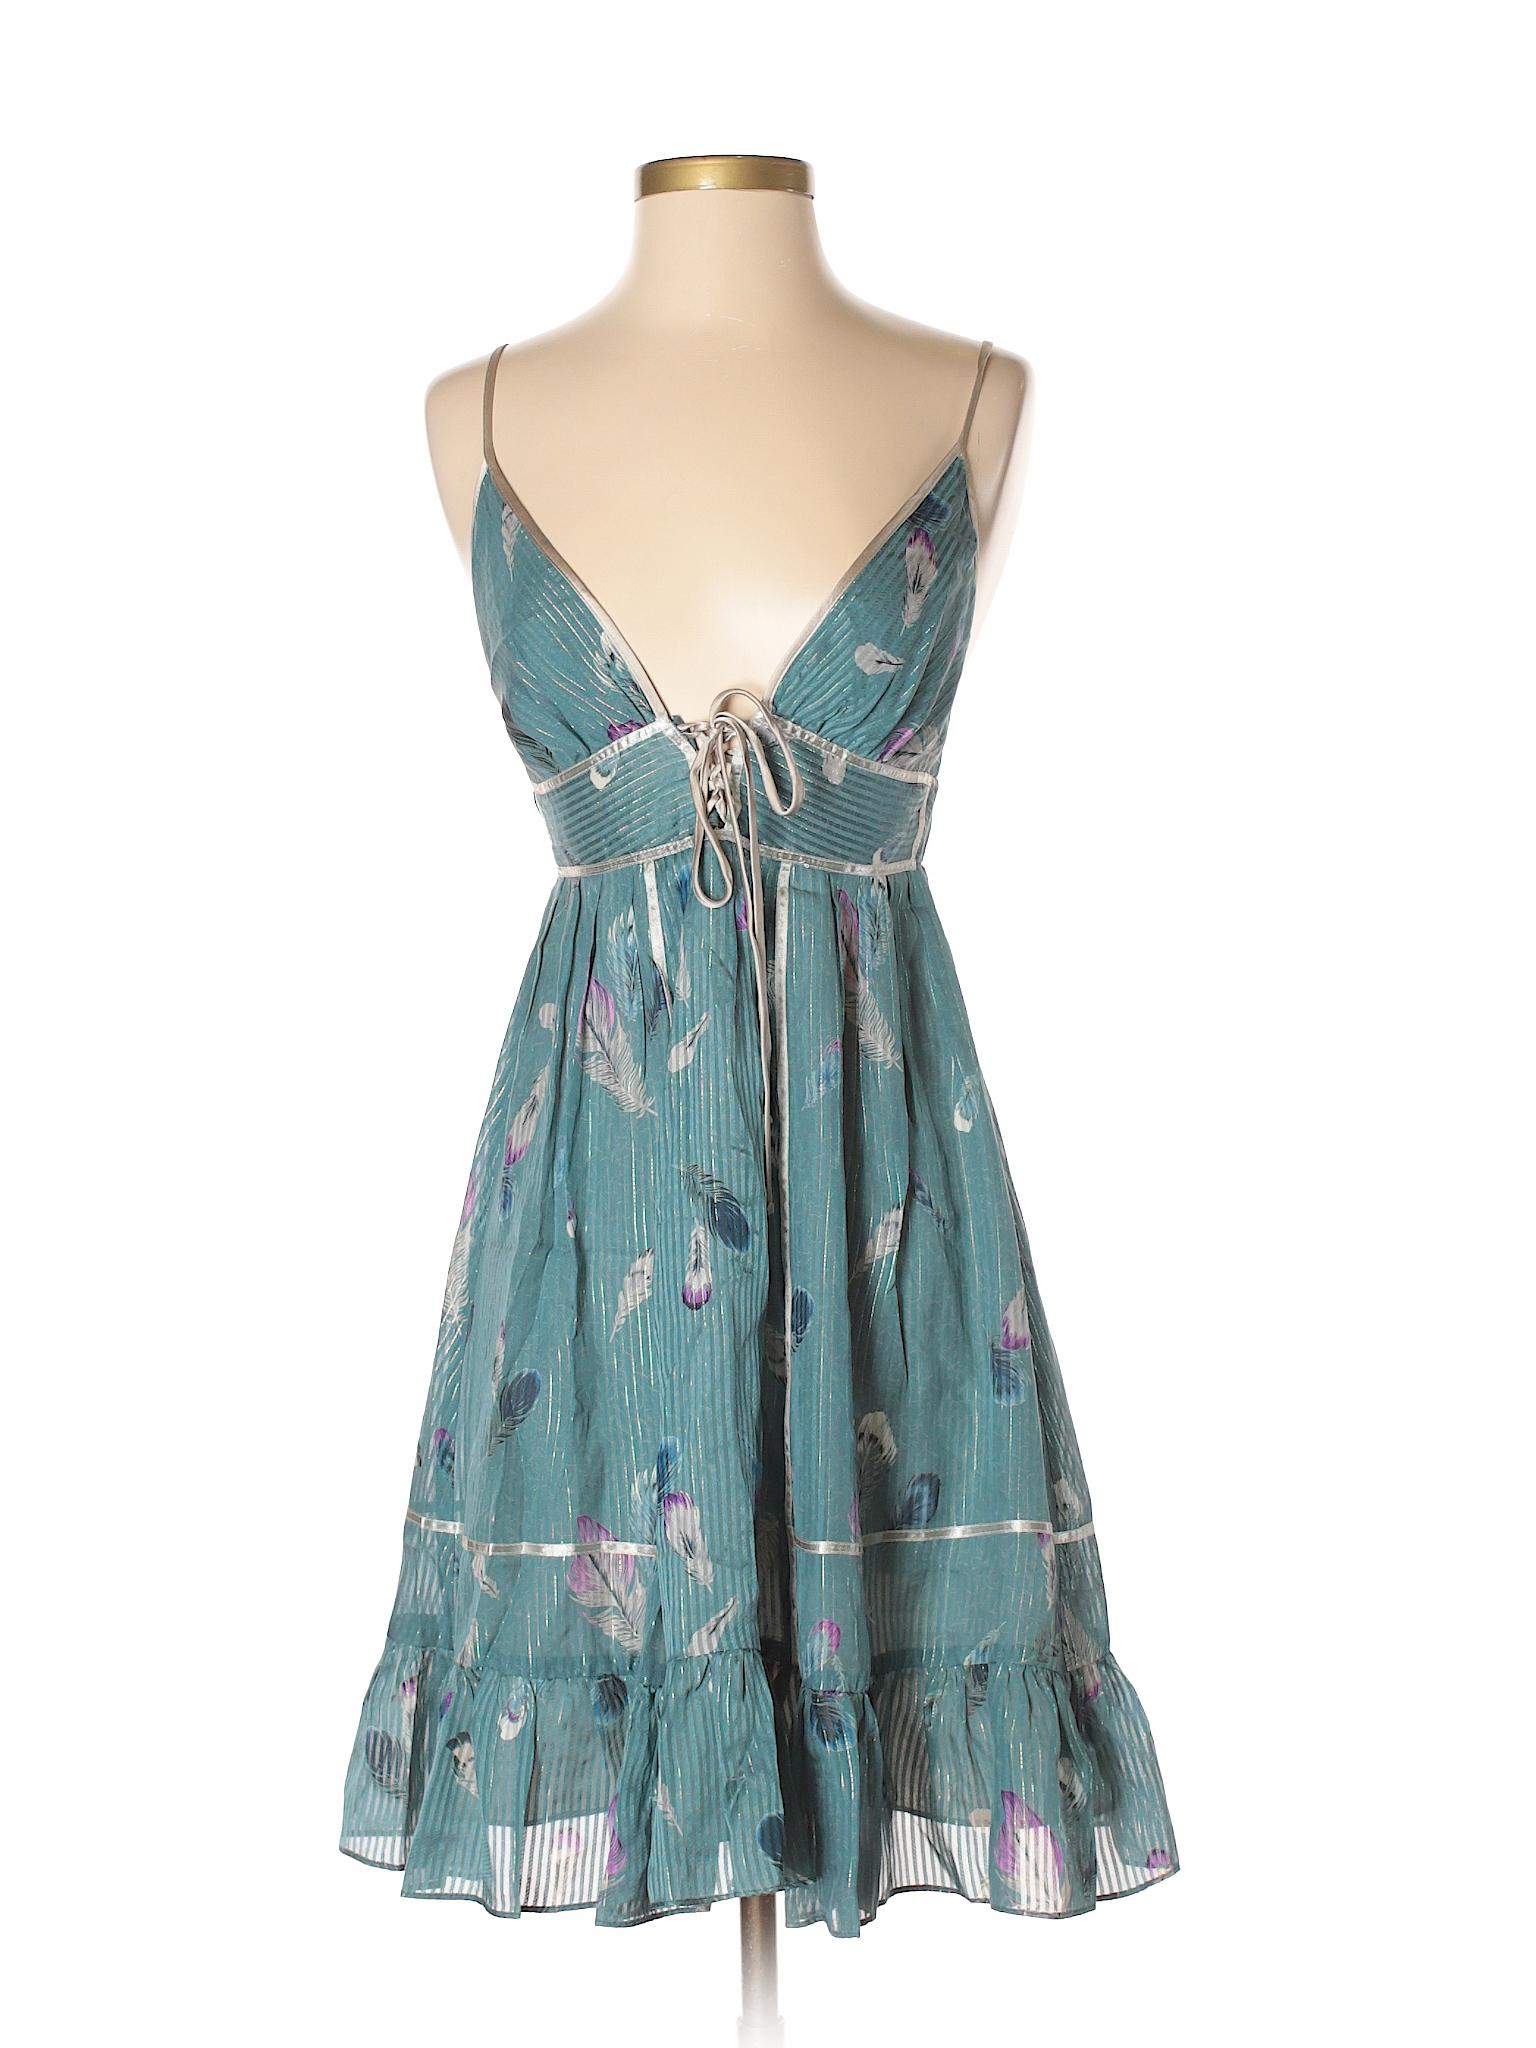 Foley Casual Boutique Dress Boutique Casual Foley Dress winter winter d0wId